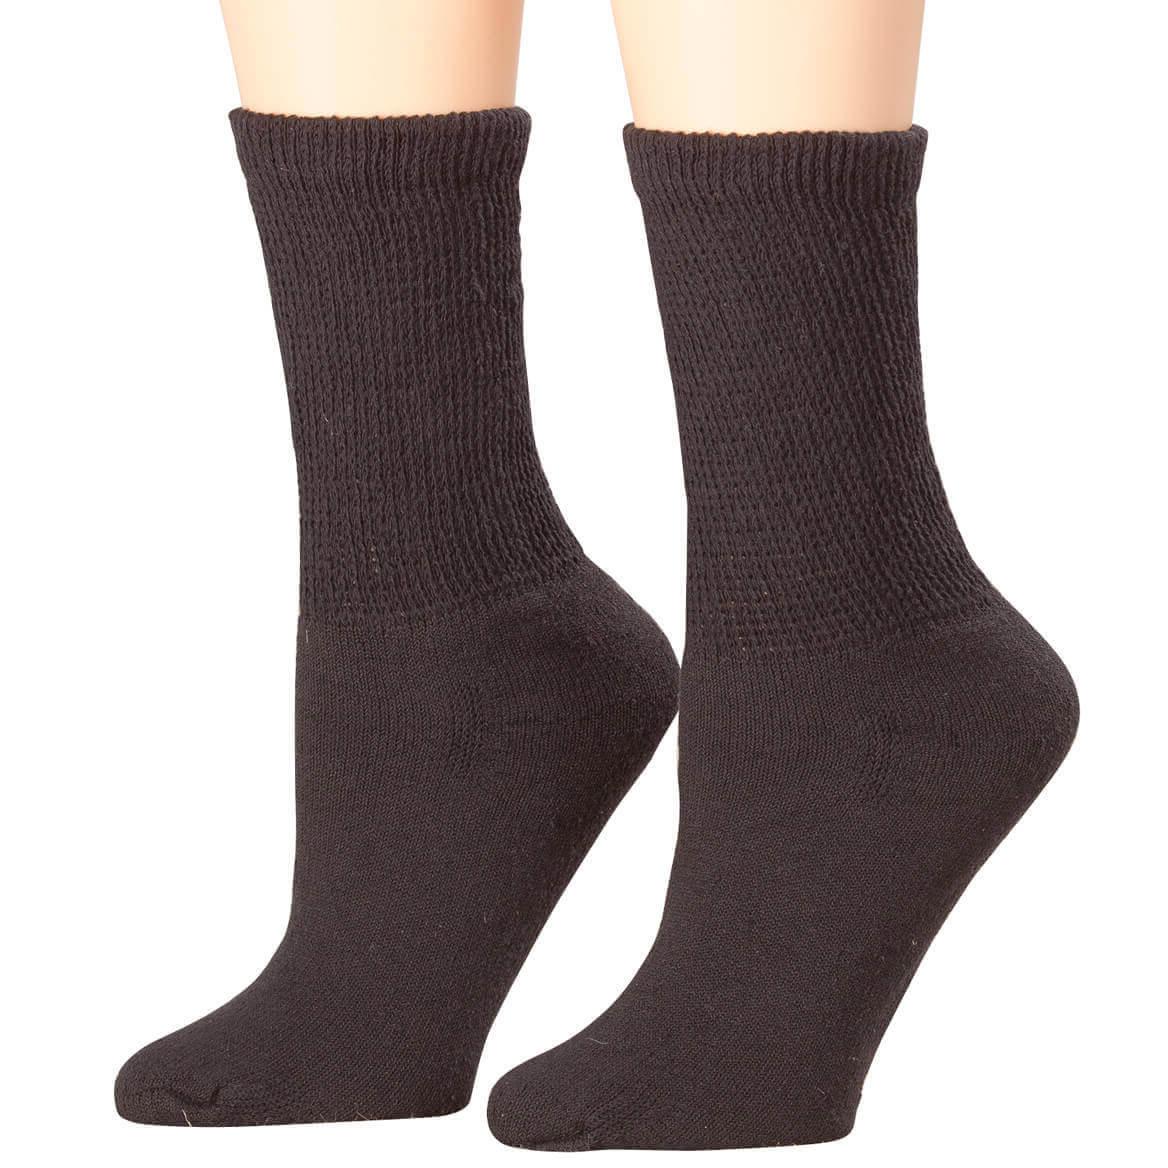 61040a943f Healthy Steps 3-Pack Diabetic Socks - Crew Socks - Miles Kimball